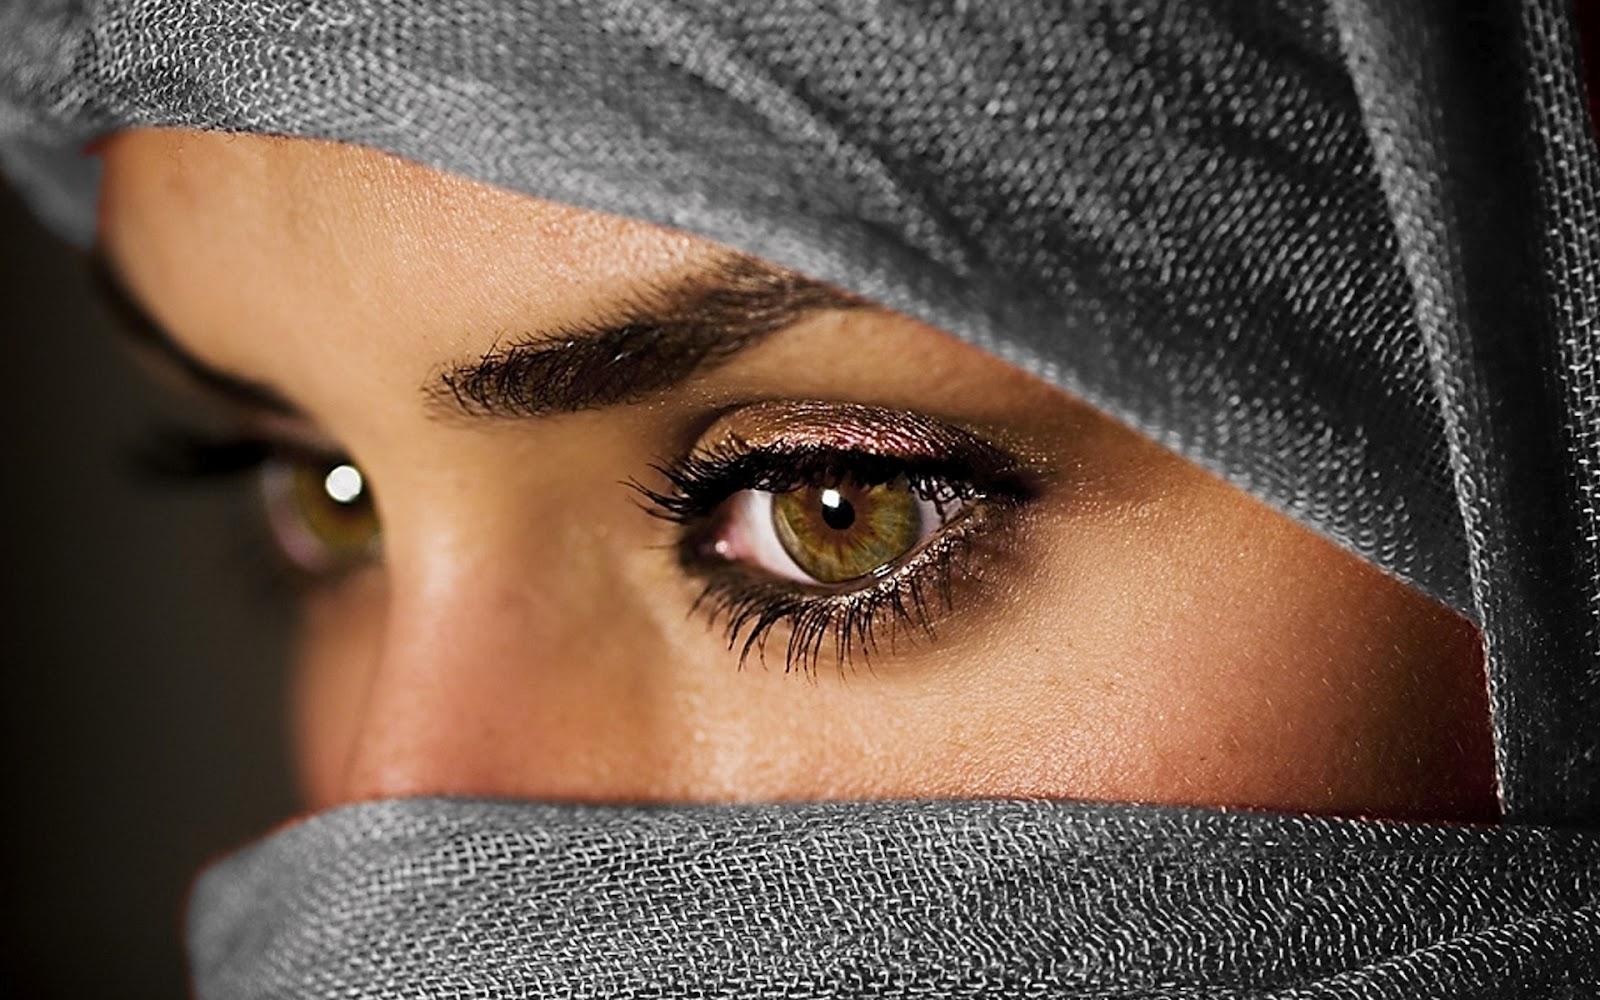 http://3.bp.blogspot.com/-xBgQmuhl02A/T4RC6B_WlXI/AAAAAAAAAyM/rJd4OhR0ehA/s1600/beautiful+eyes+girl.jpg